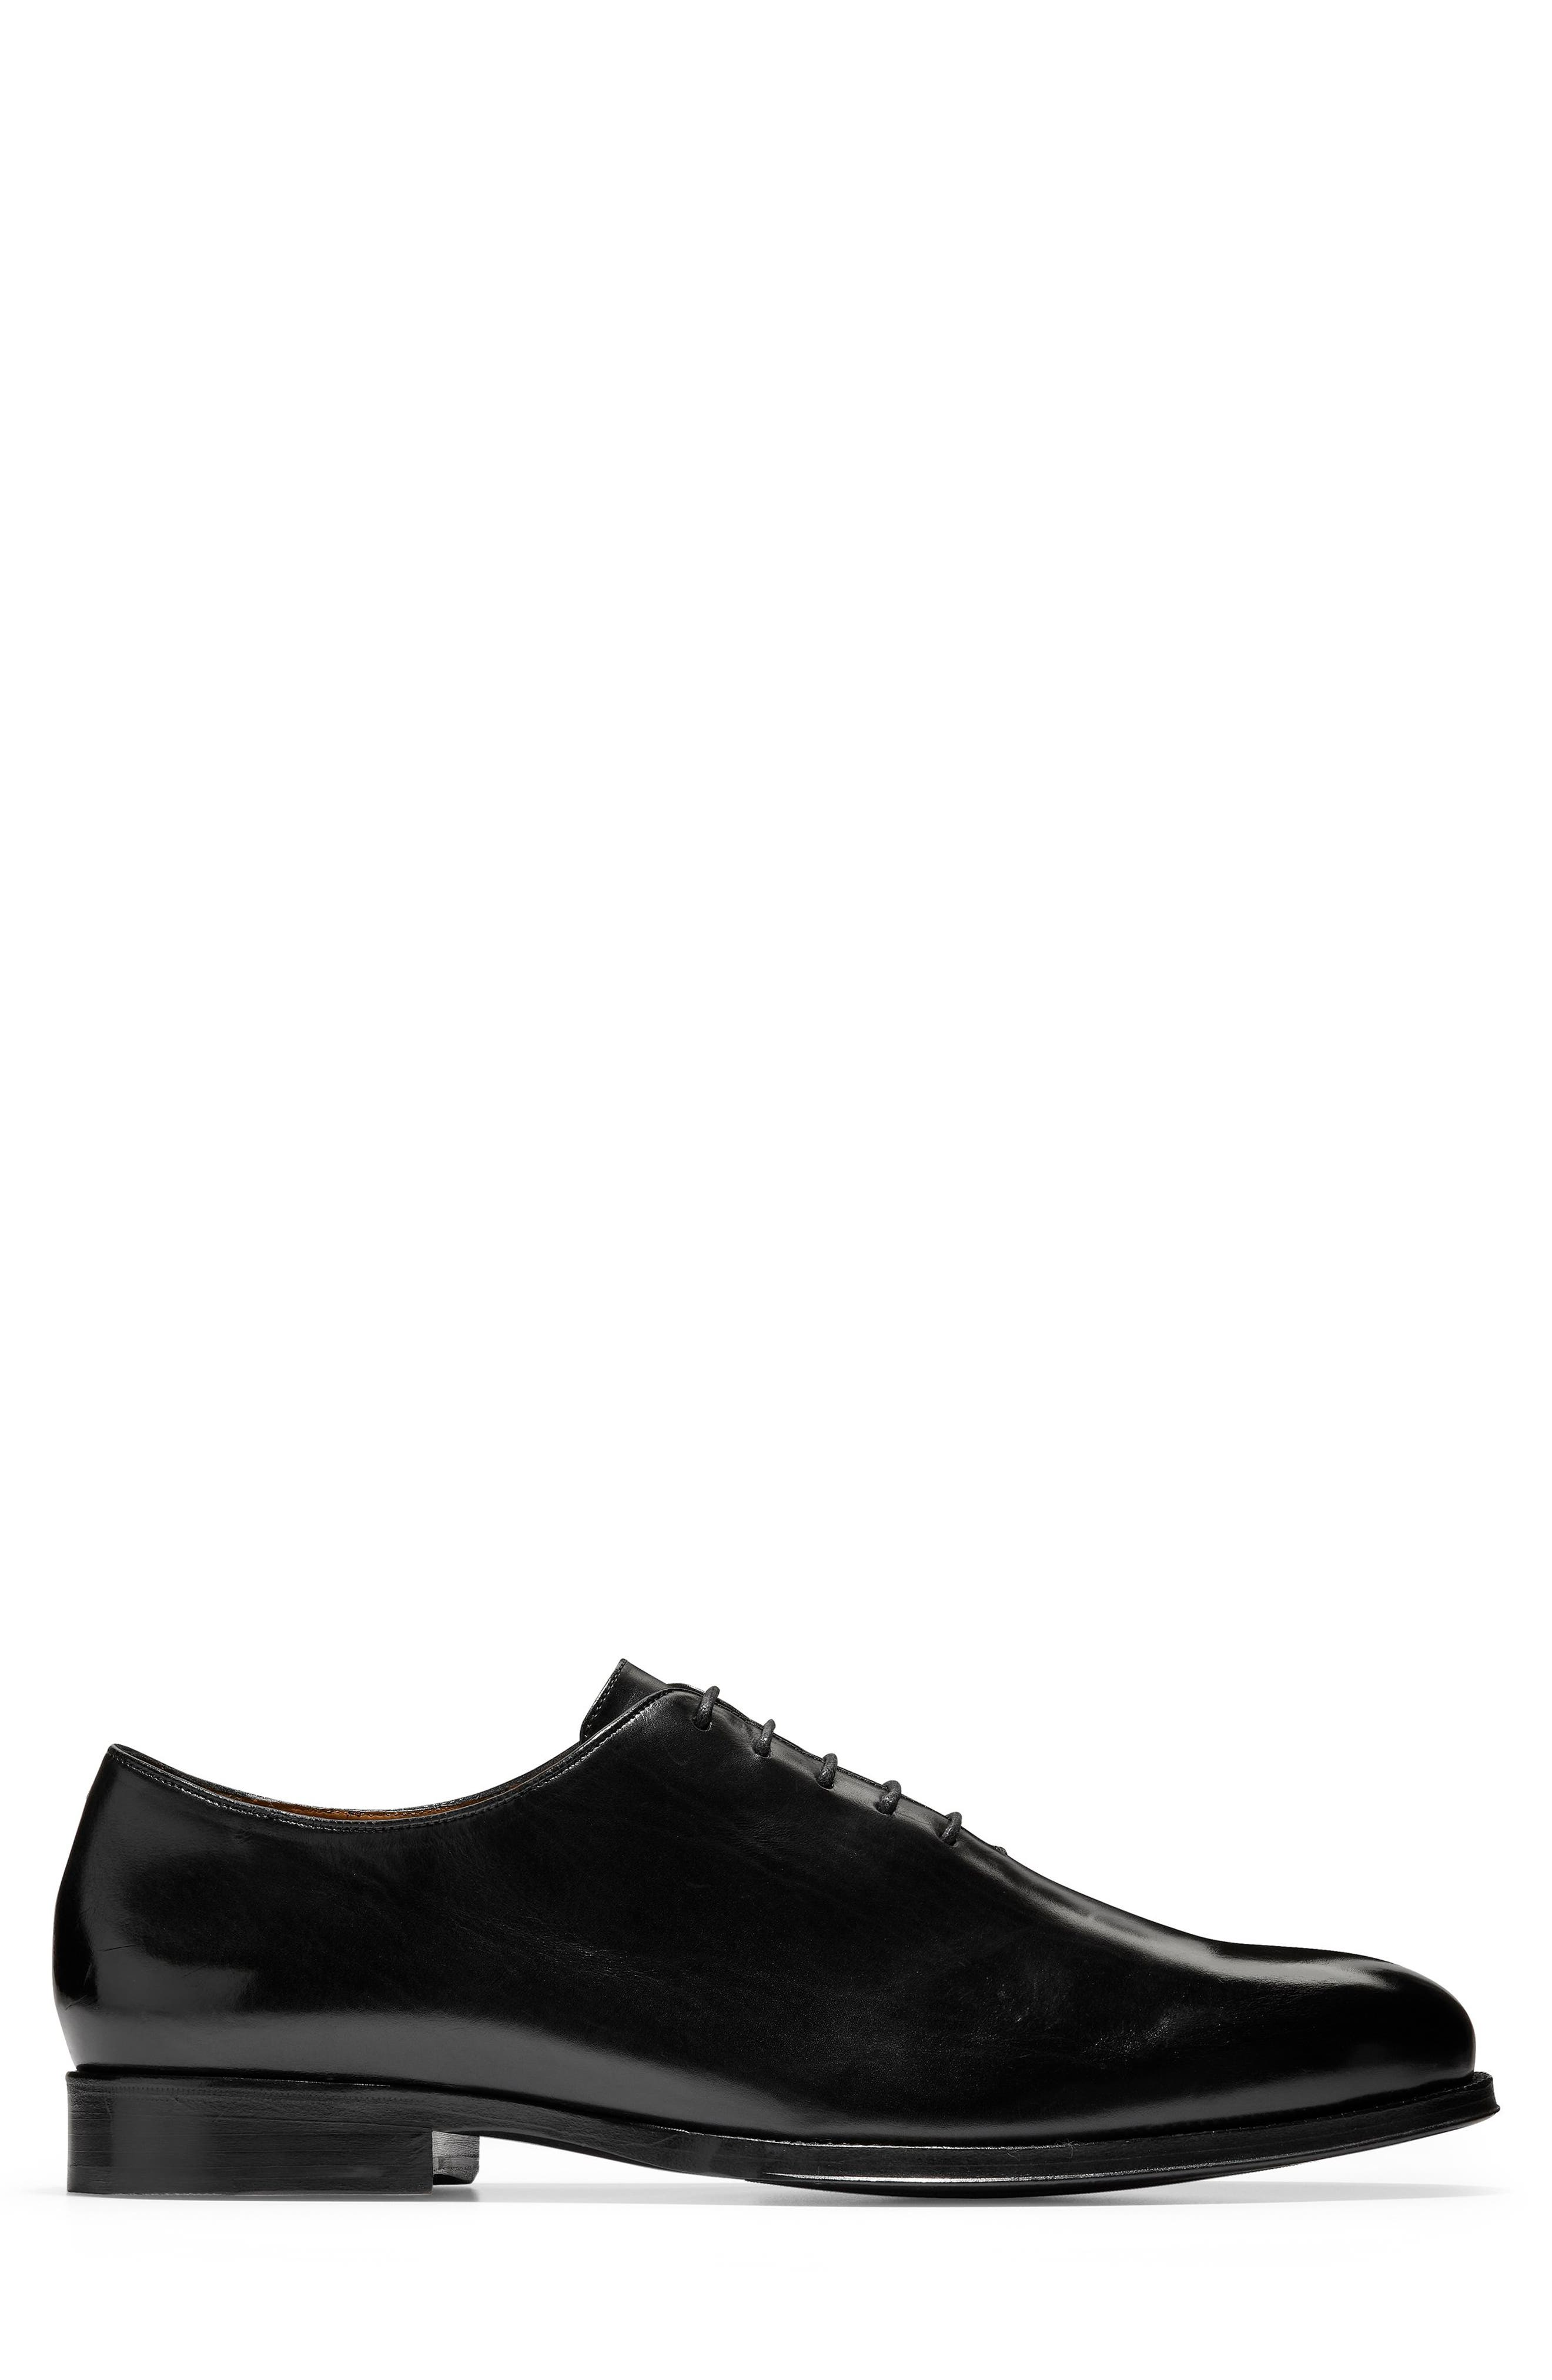 COLE HAAN, American Classics Gramercy Whole Cut Shoe, Alternate thumbnail 3, color, BLACK LEATHER